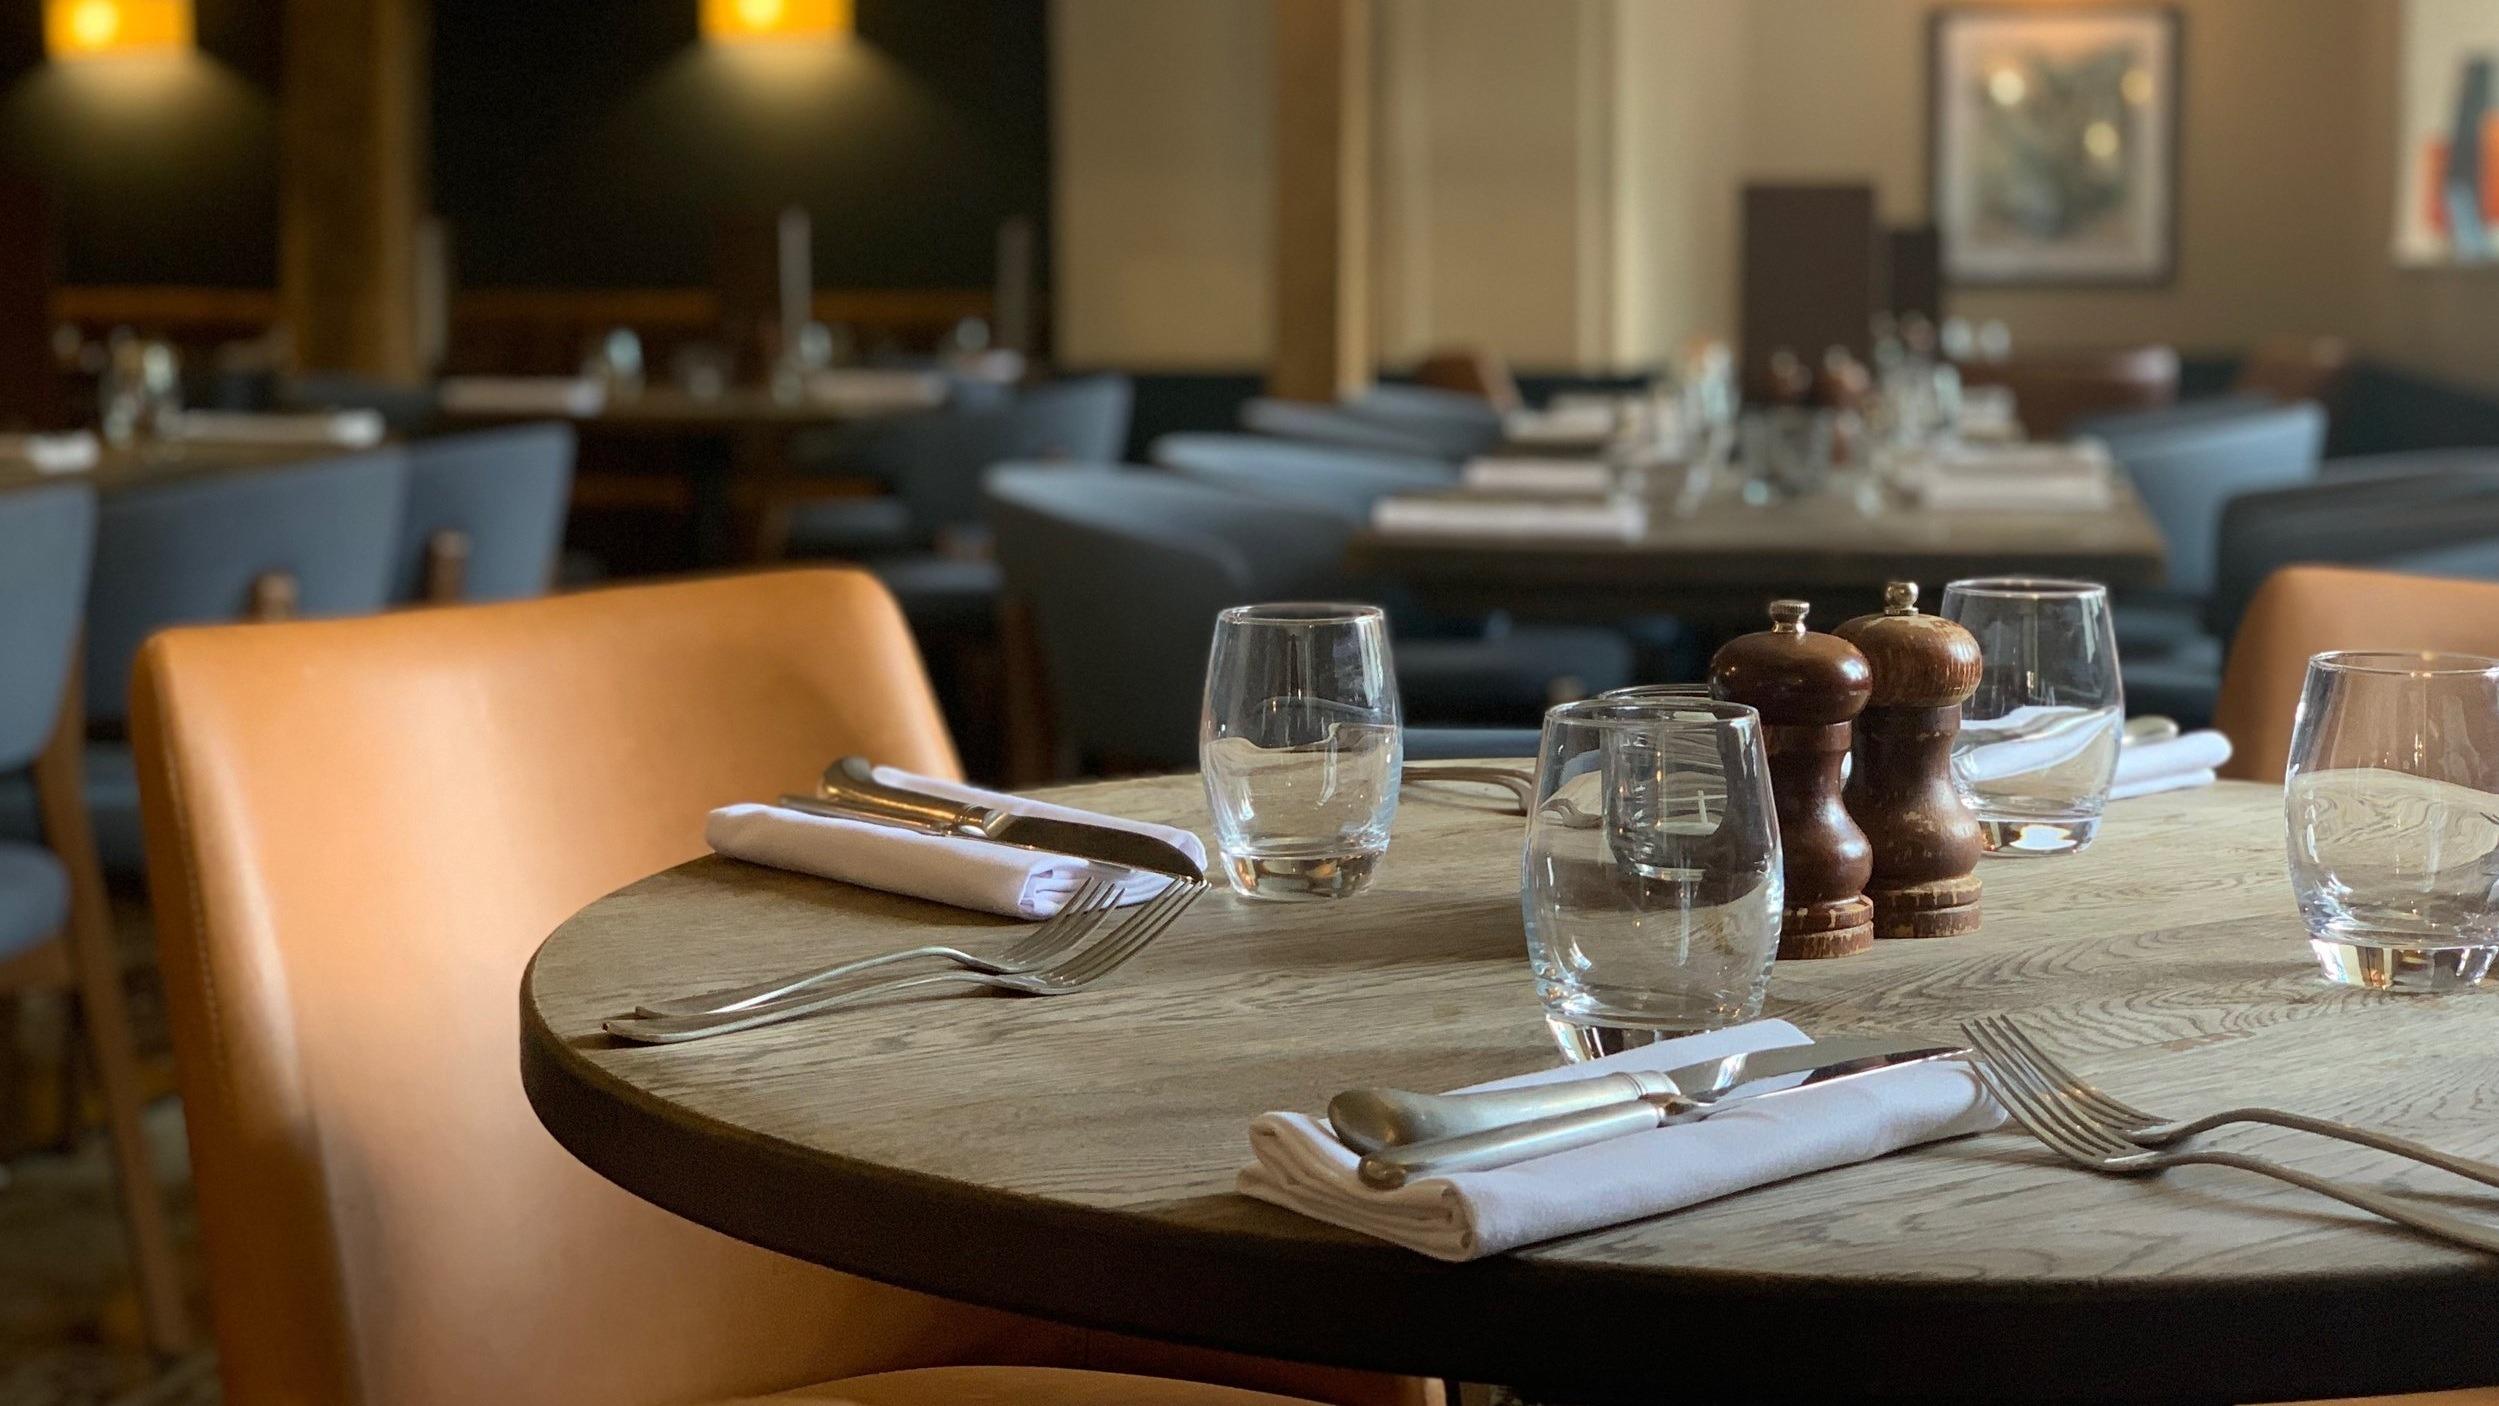 Table at The Shurlock Inn